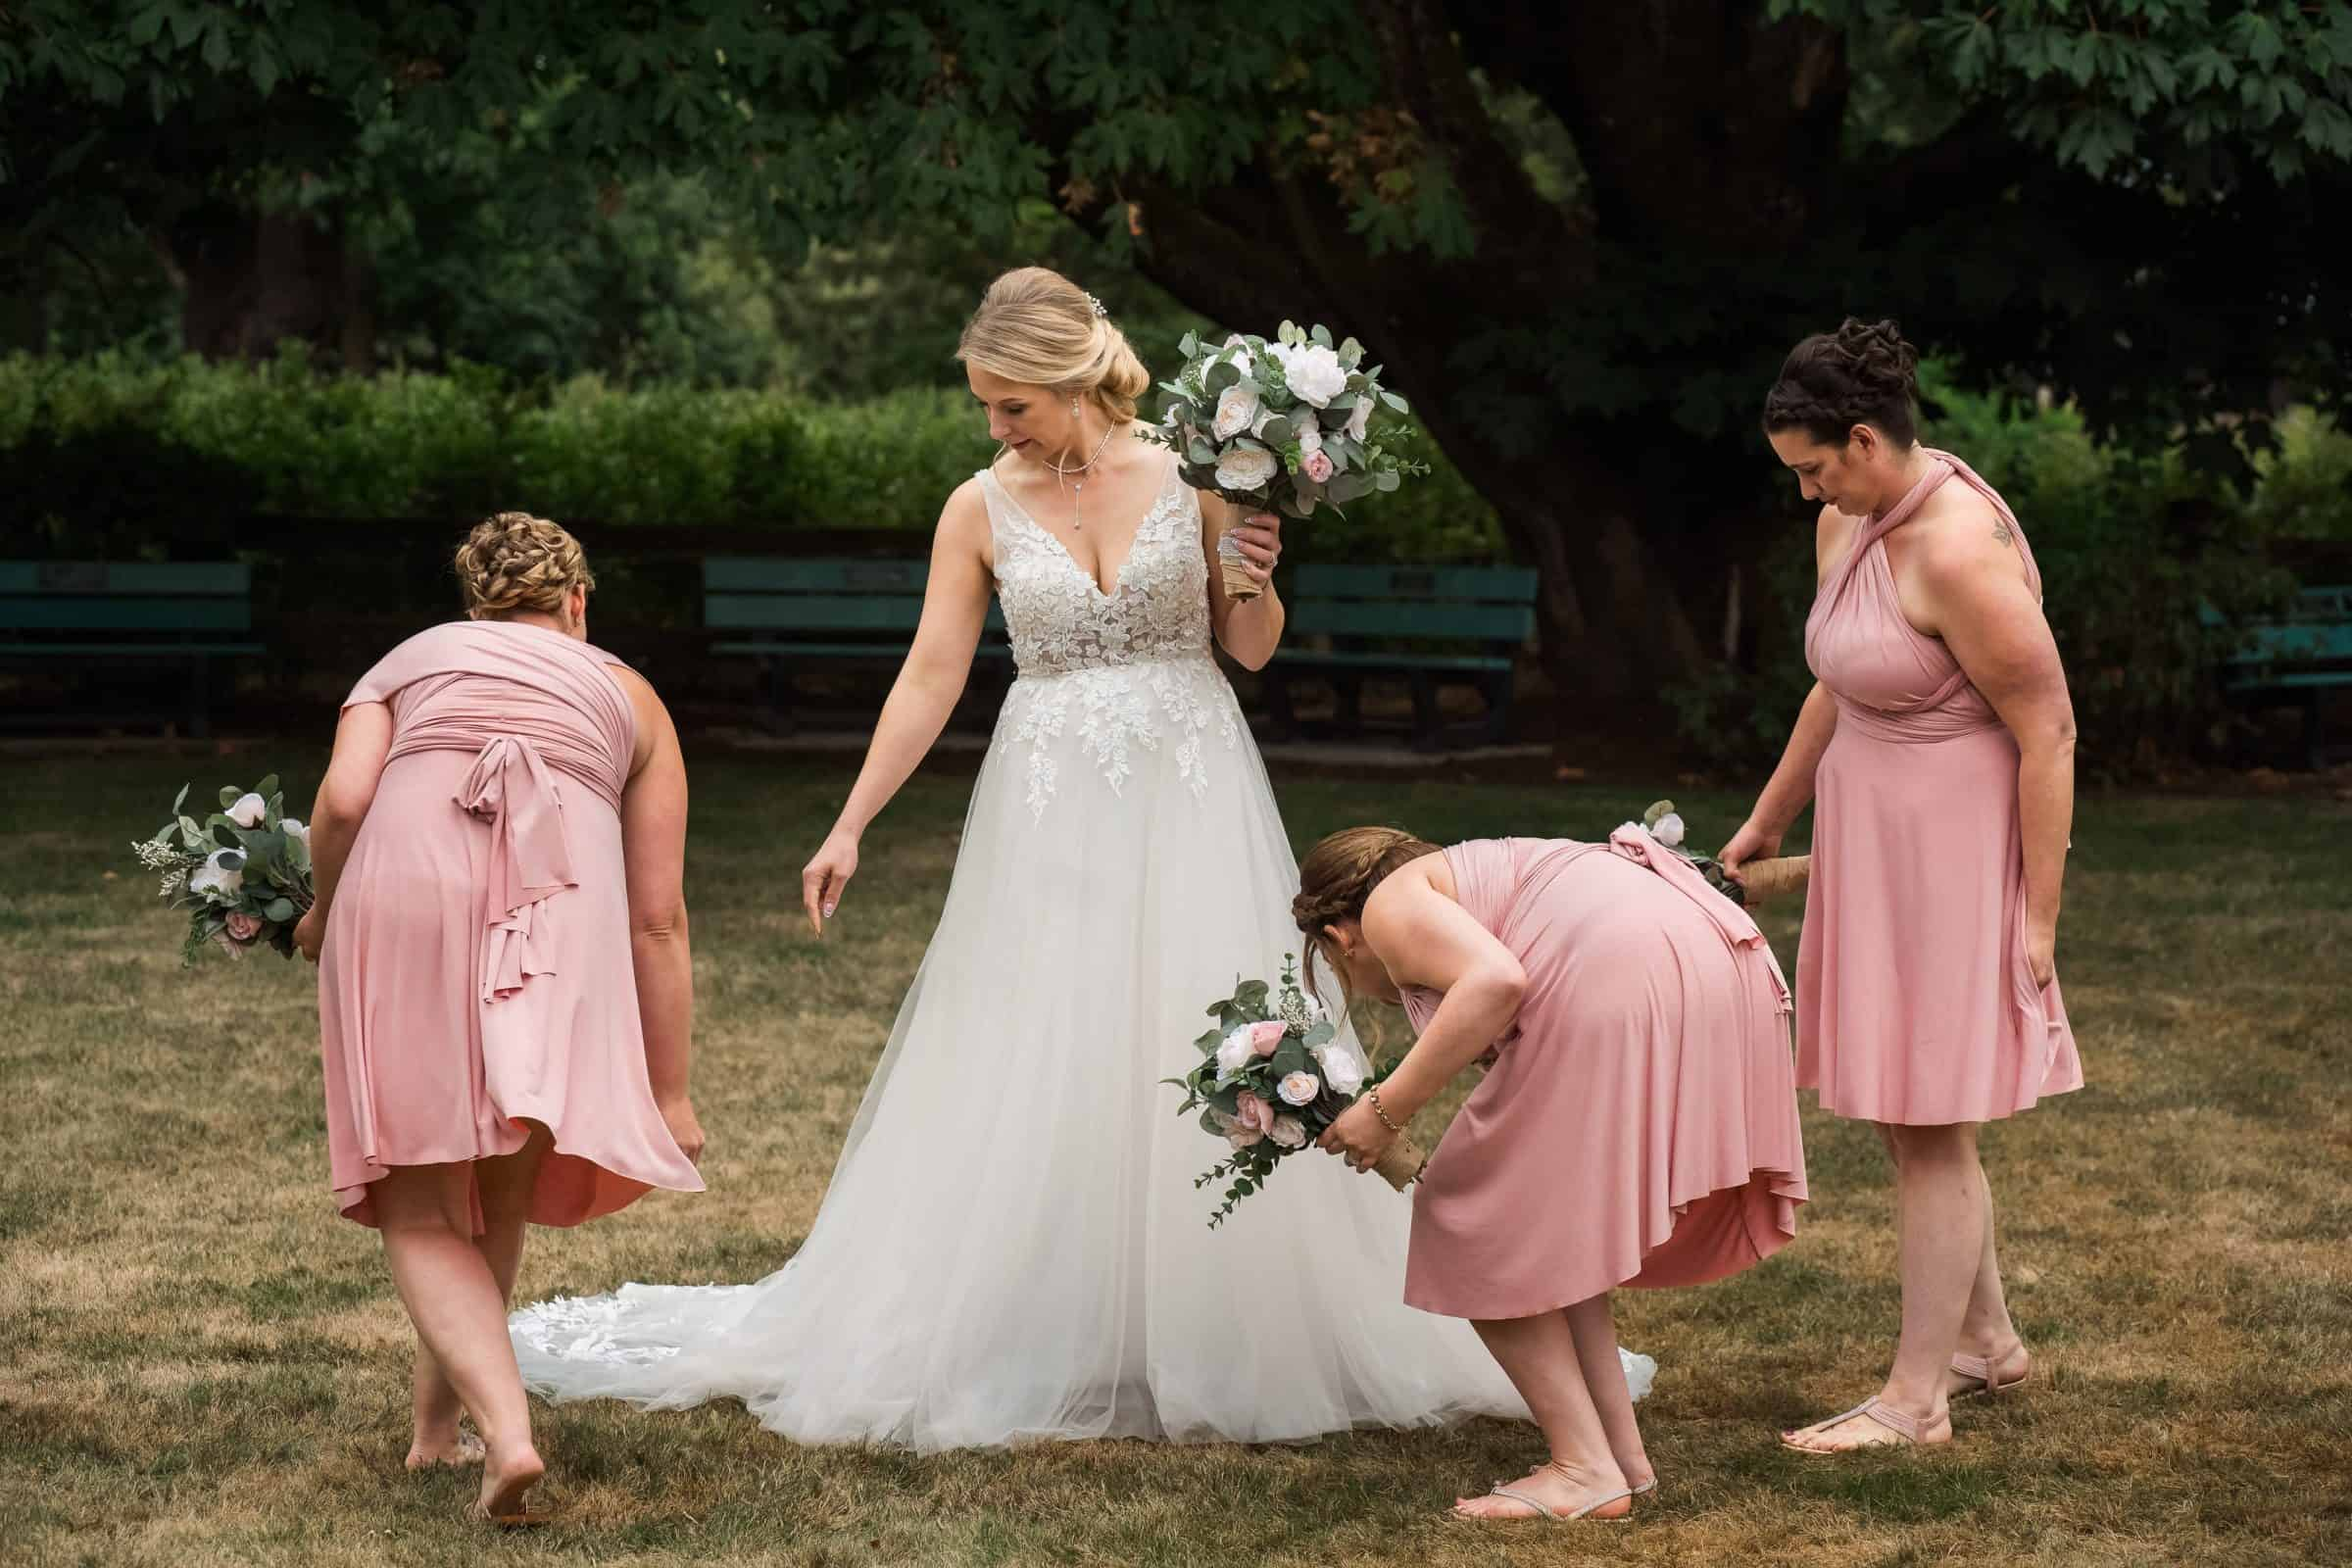 bridal party girls helping arrange bride's dress